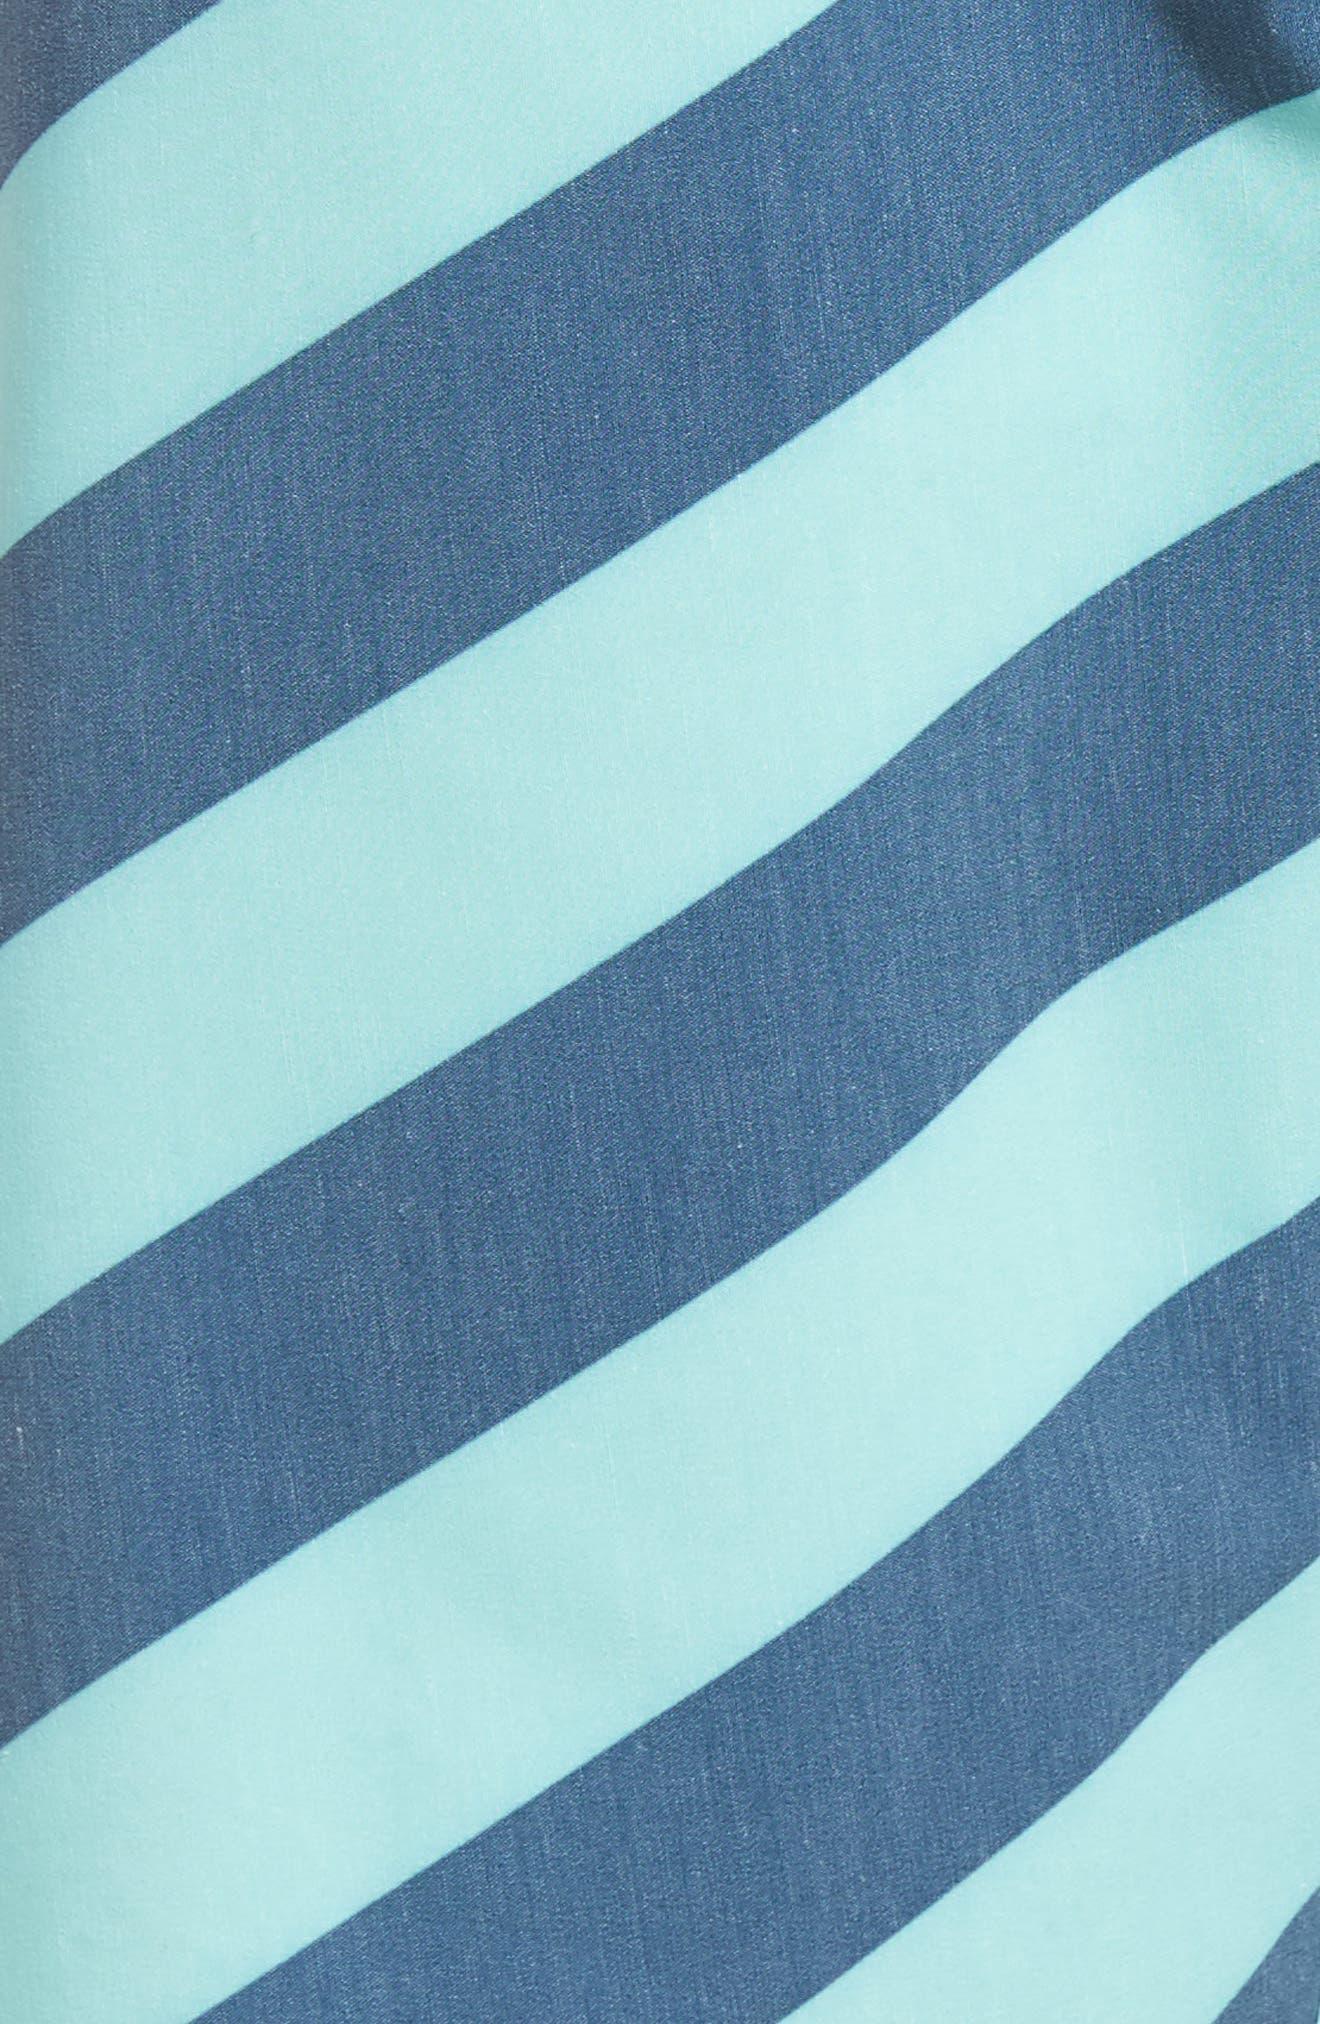 Stripey Slinger Board Shorts,                             Alternate thumbnail 35, color,